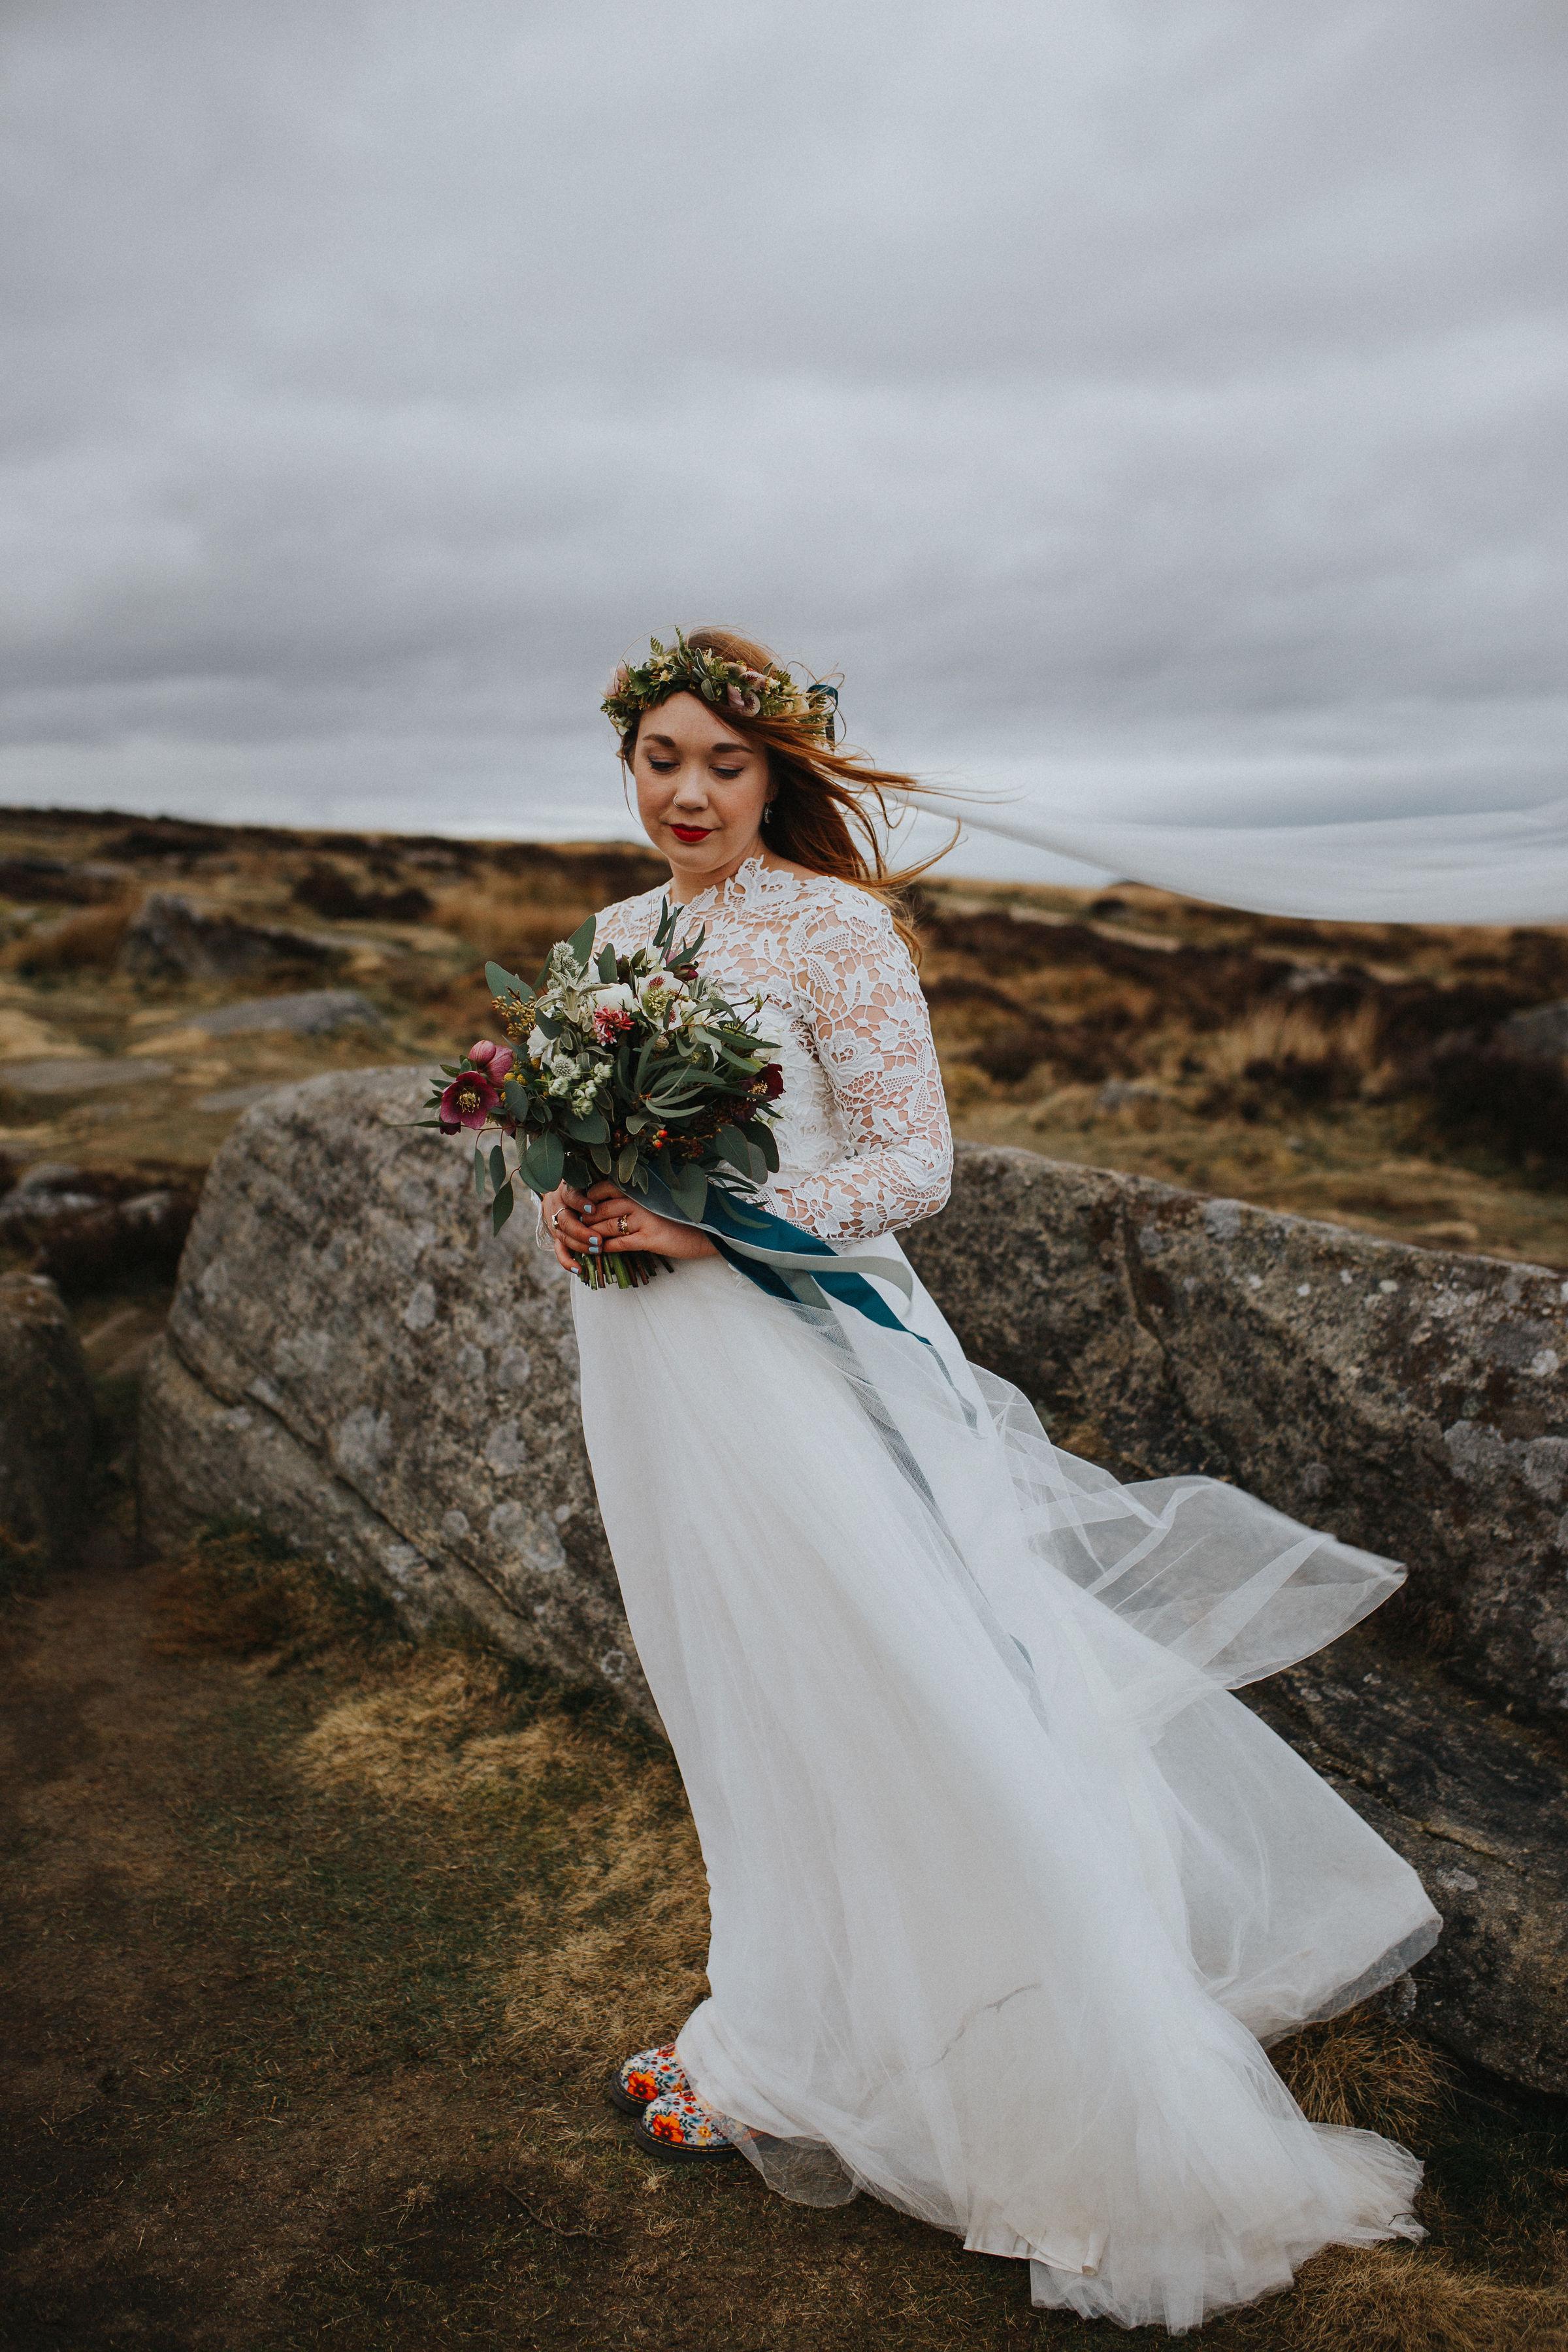 Rosie-bespoke-lace-long sleeved-tulle-wedding-dress-winter-peak district-susanna greening-25.jpg